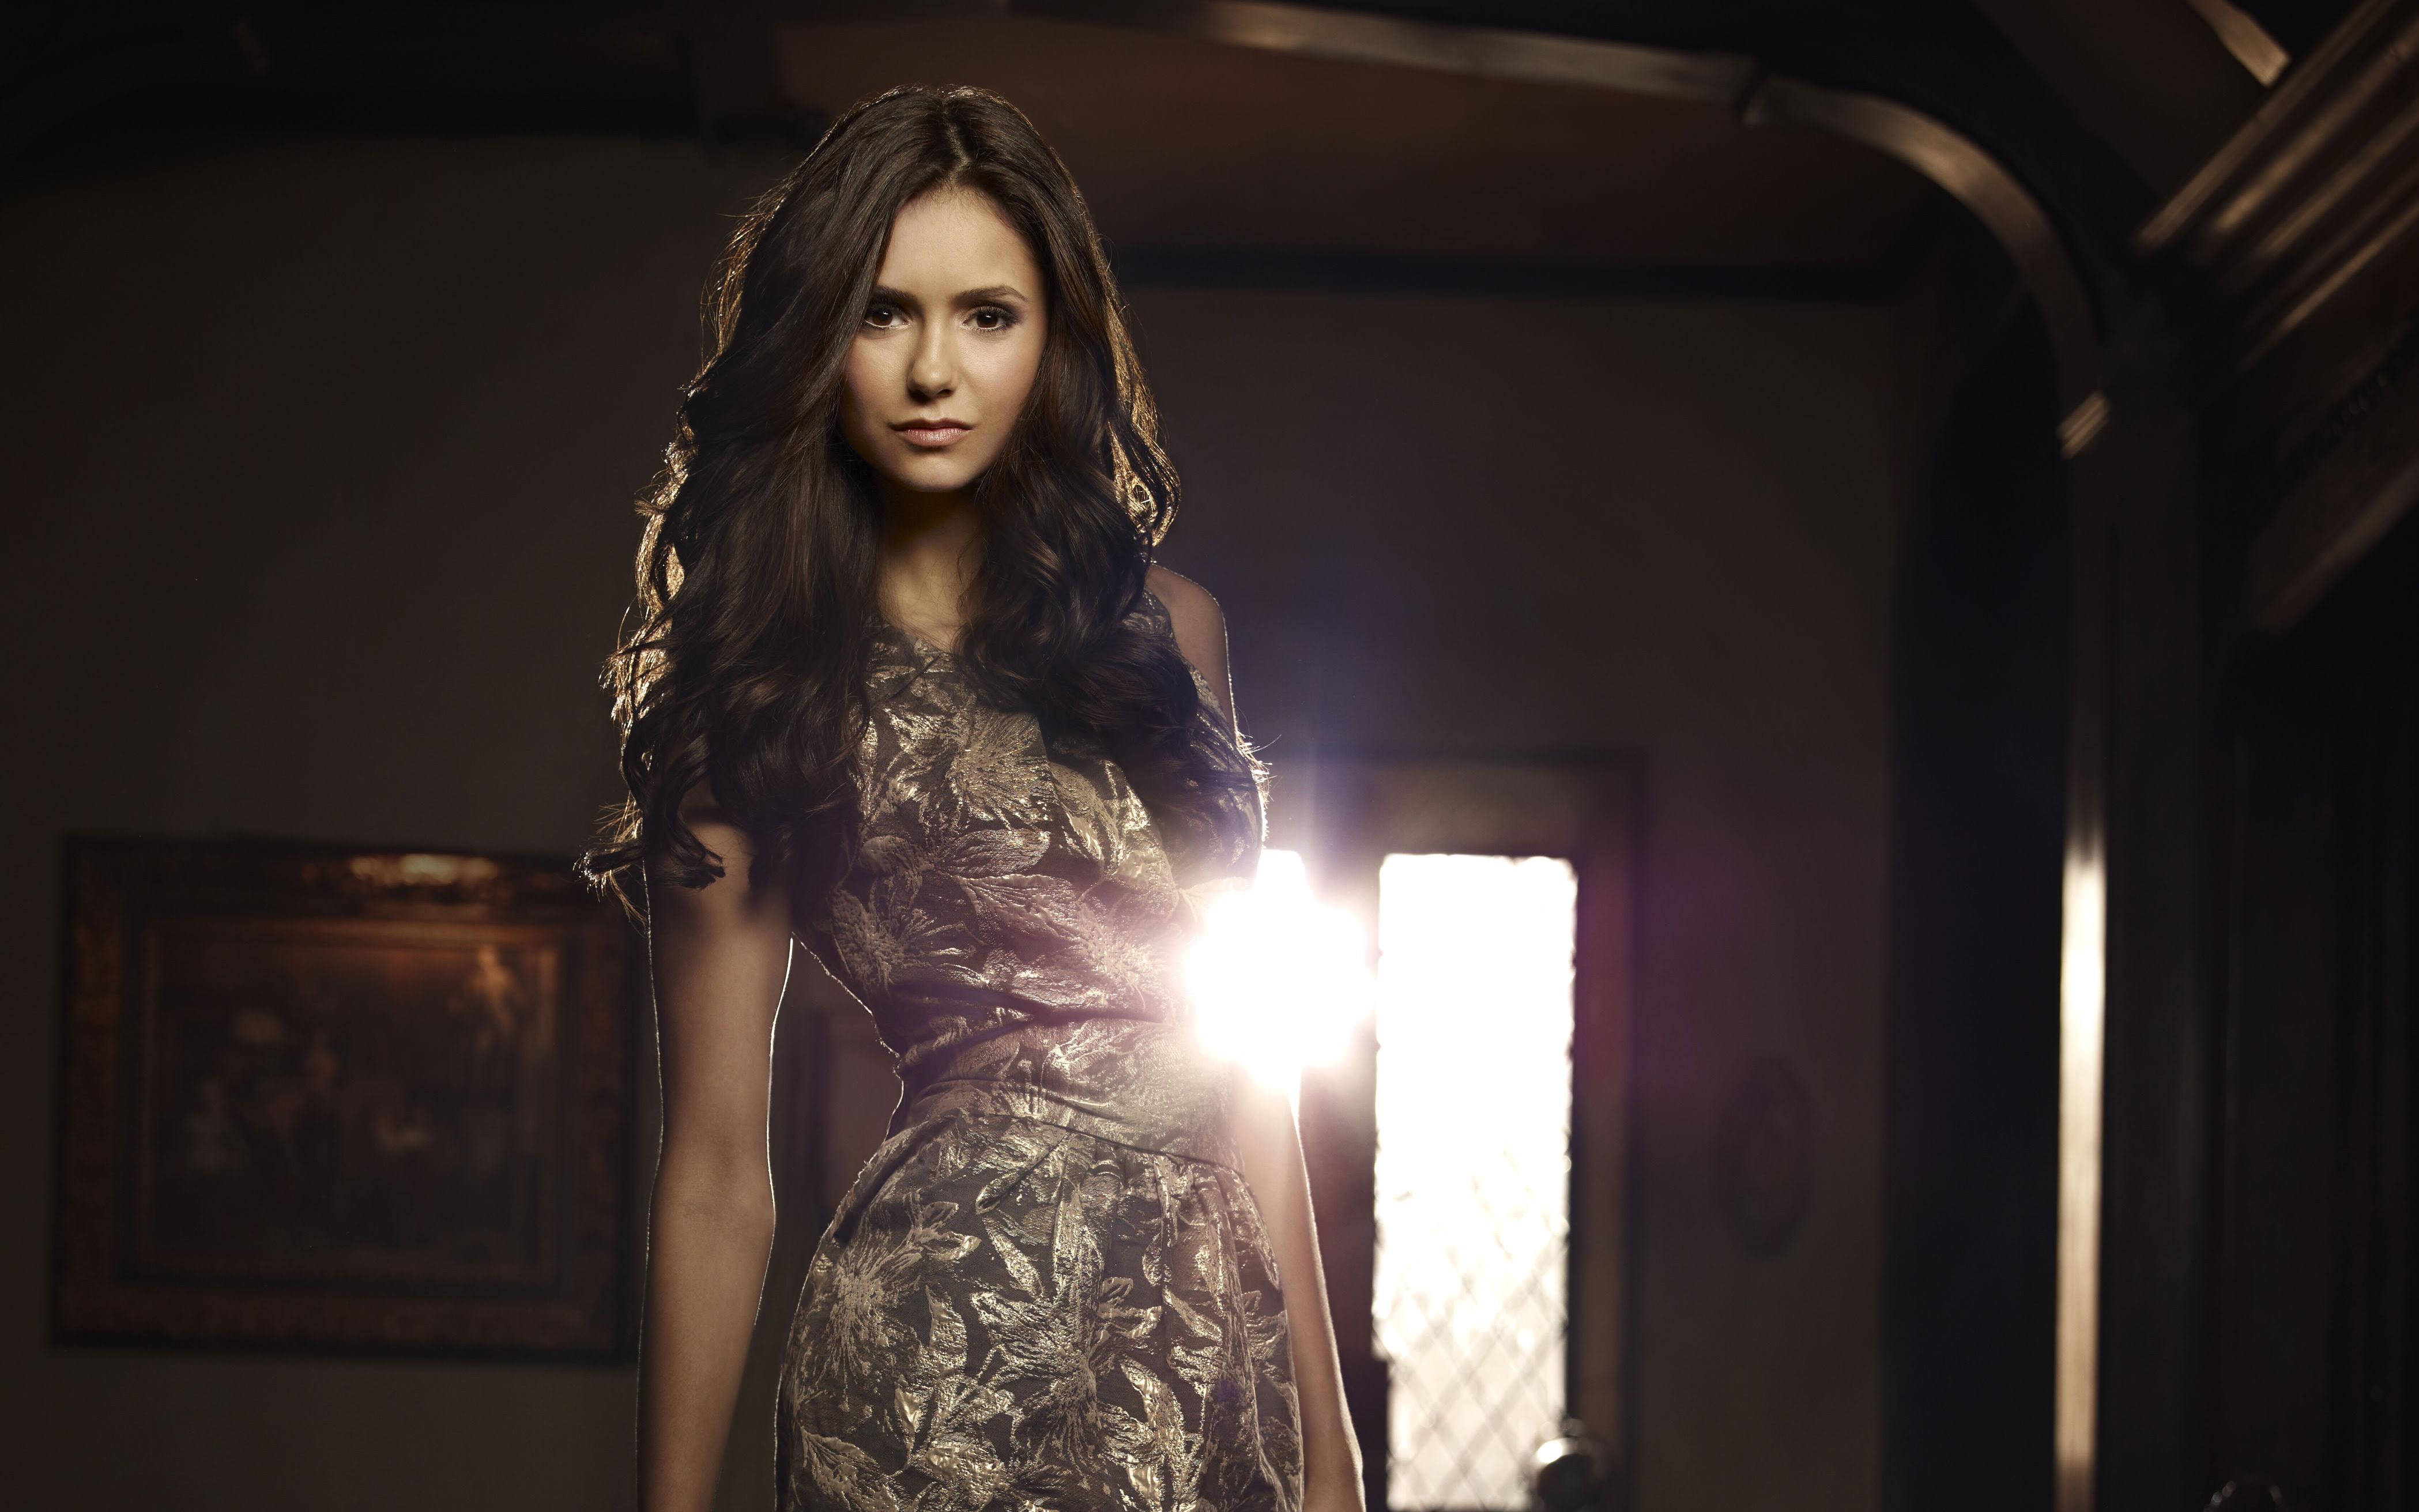 Nina Dobrev In Vampire Diaries 4k Wallpapers Hd Wallpapers